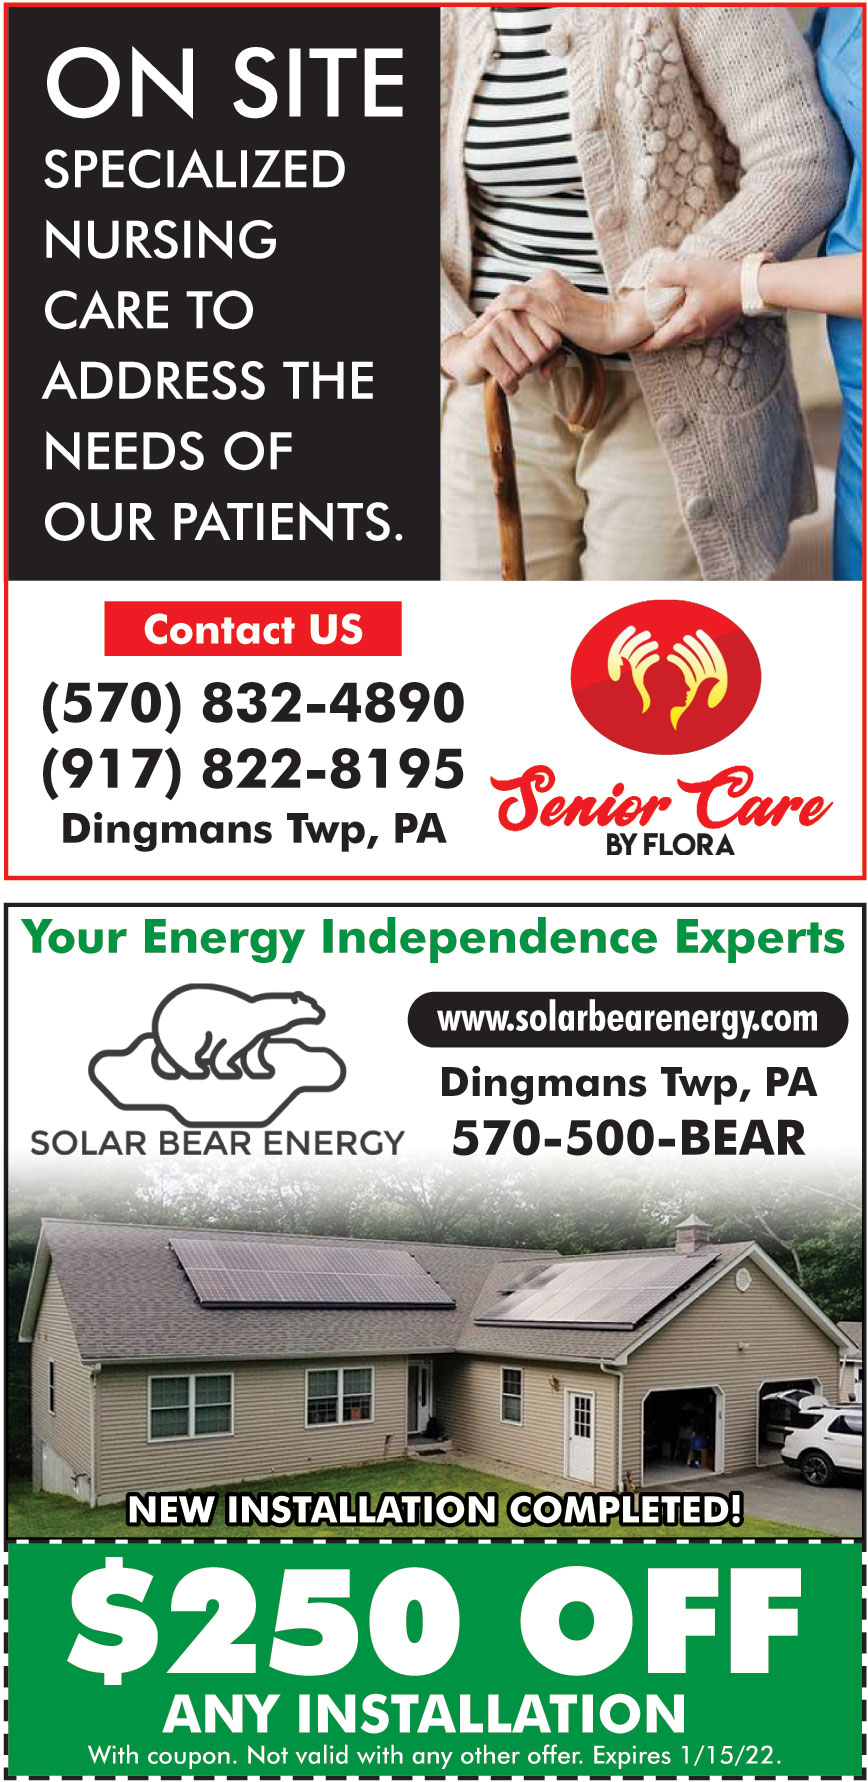 SOLAR BEAR ENERGY LLC